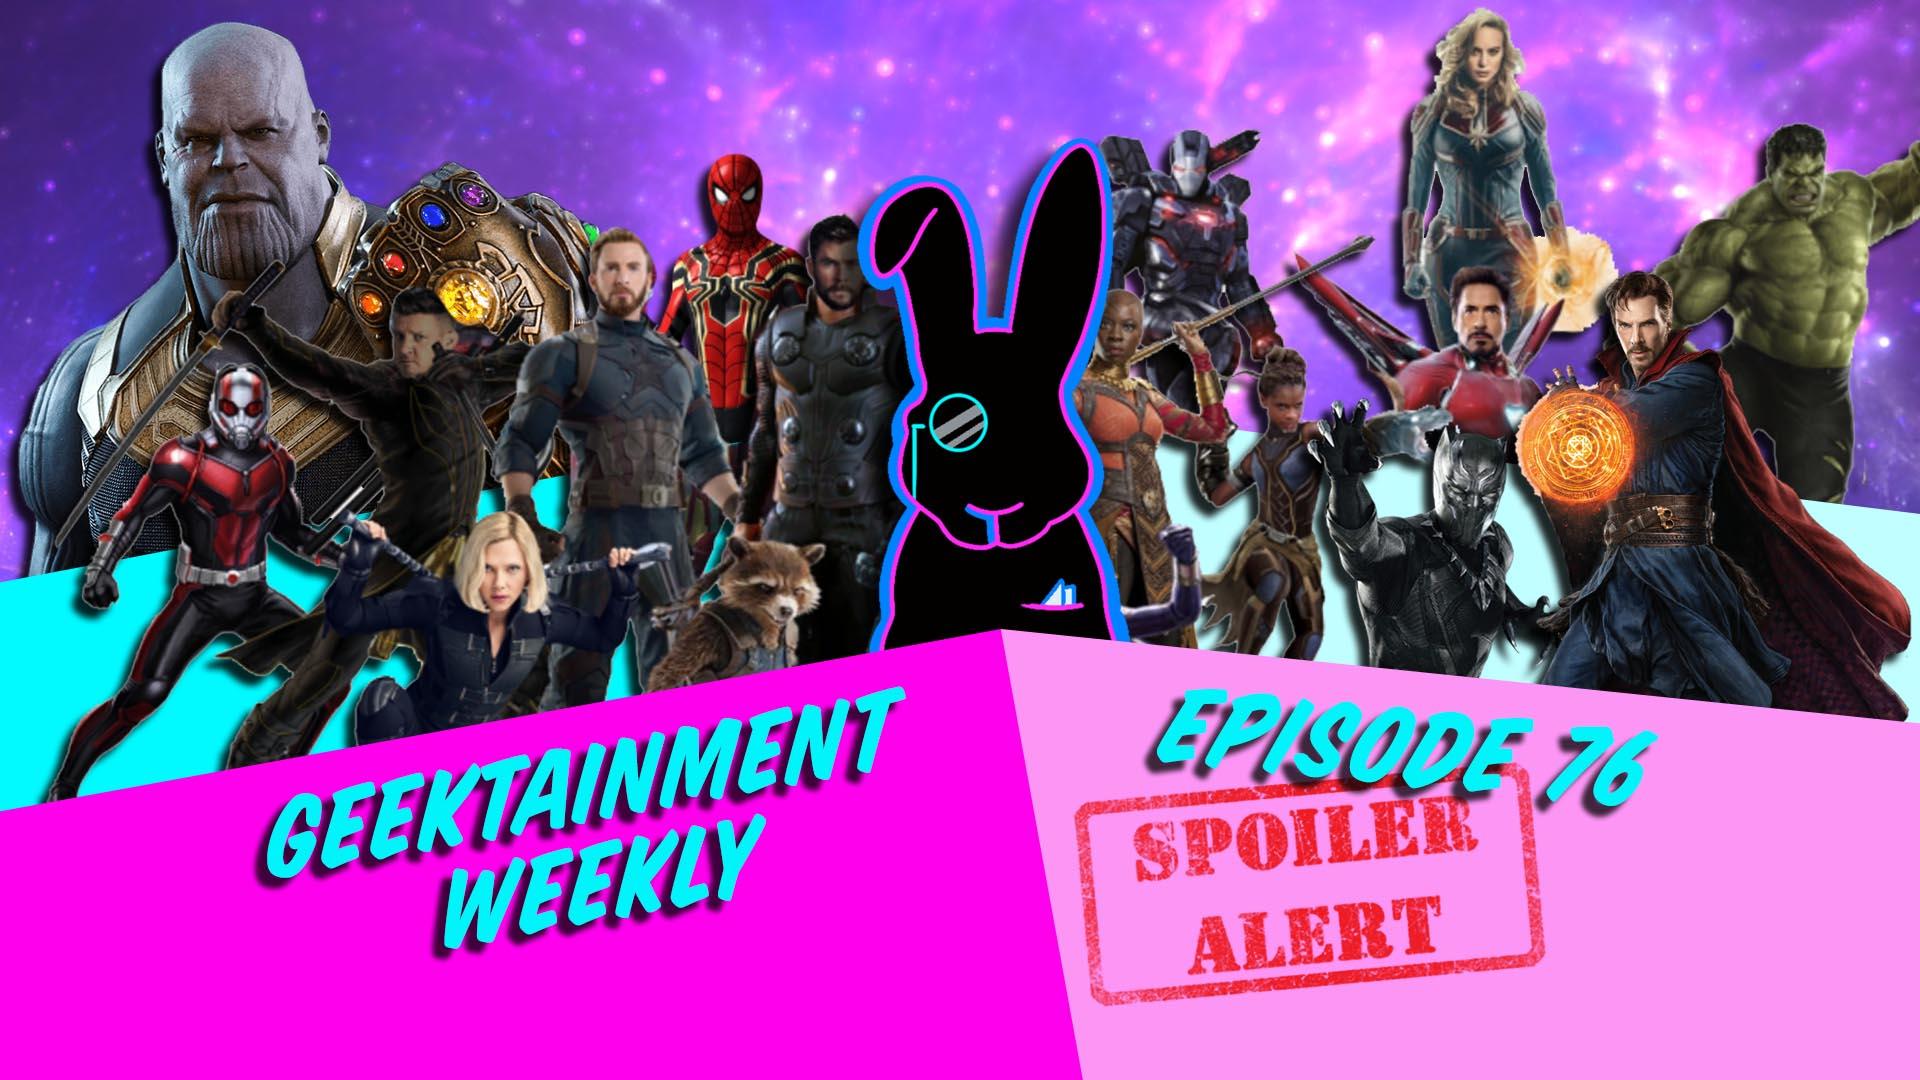 Geektainment Weekly - Episode 76